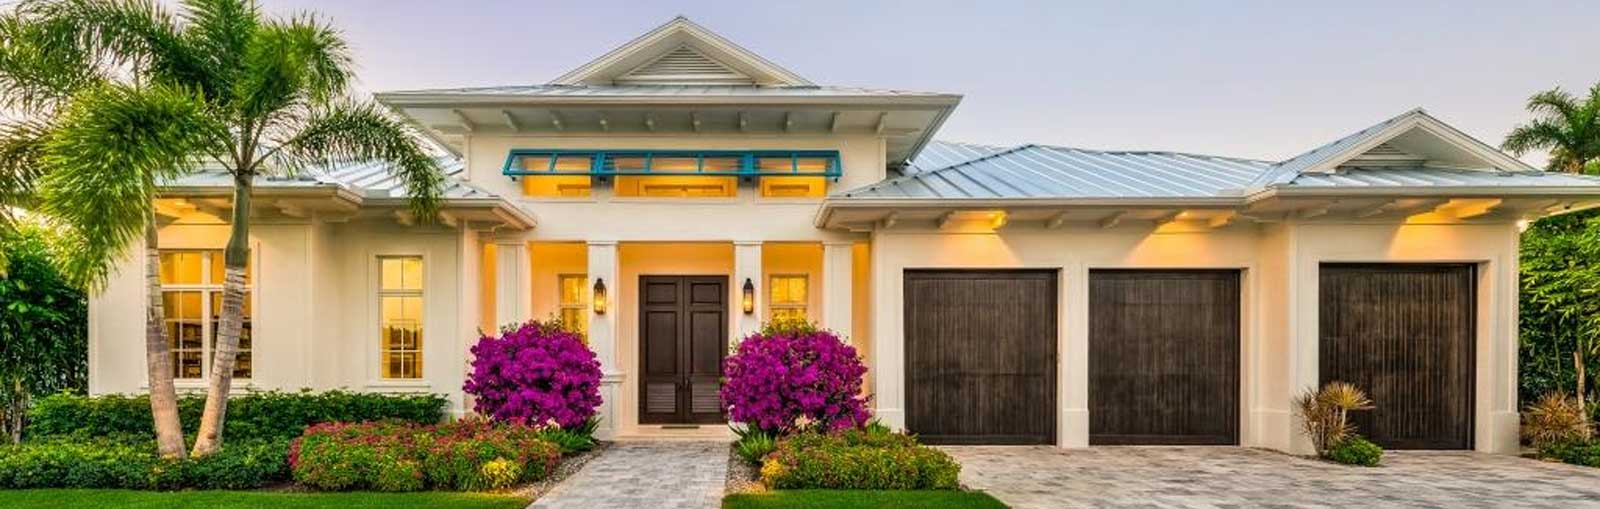 Haute Residence Front Elevation | Knauf-Koenig Group - Naples, Florida General Contractor